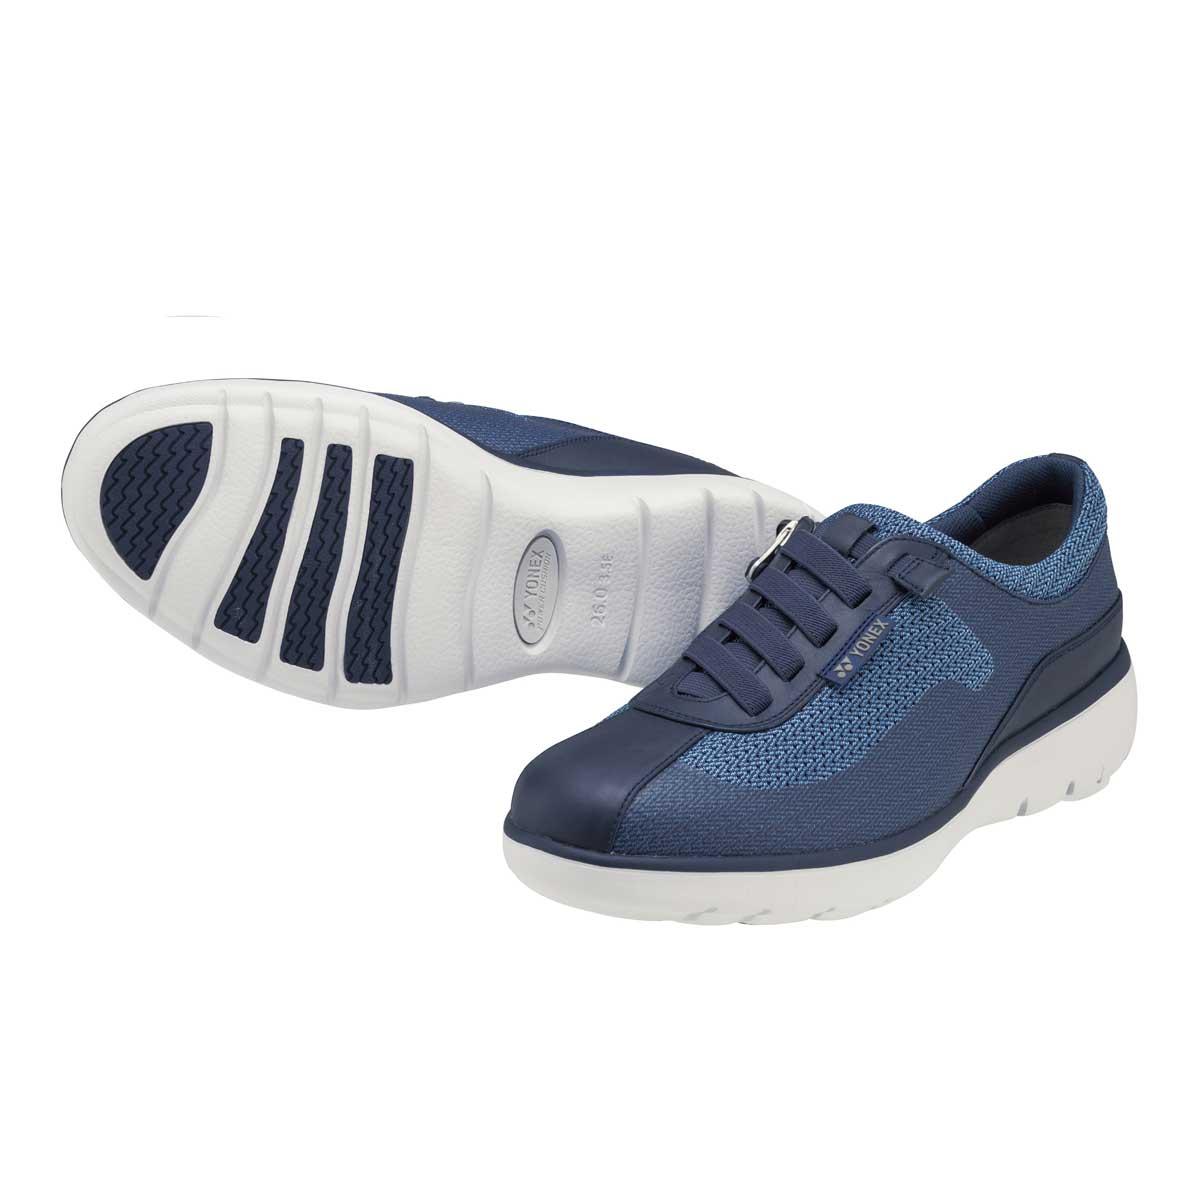 YONEX ヨネックス MC94 ネイビー (メンズ)軽い疲れにくいウォーキングシューズ「靴」